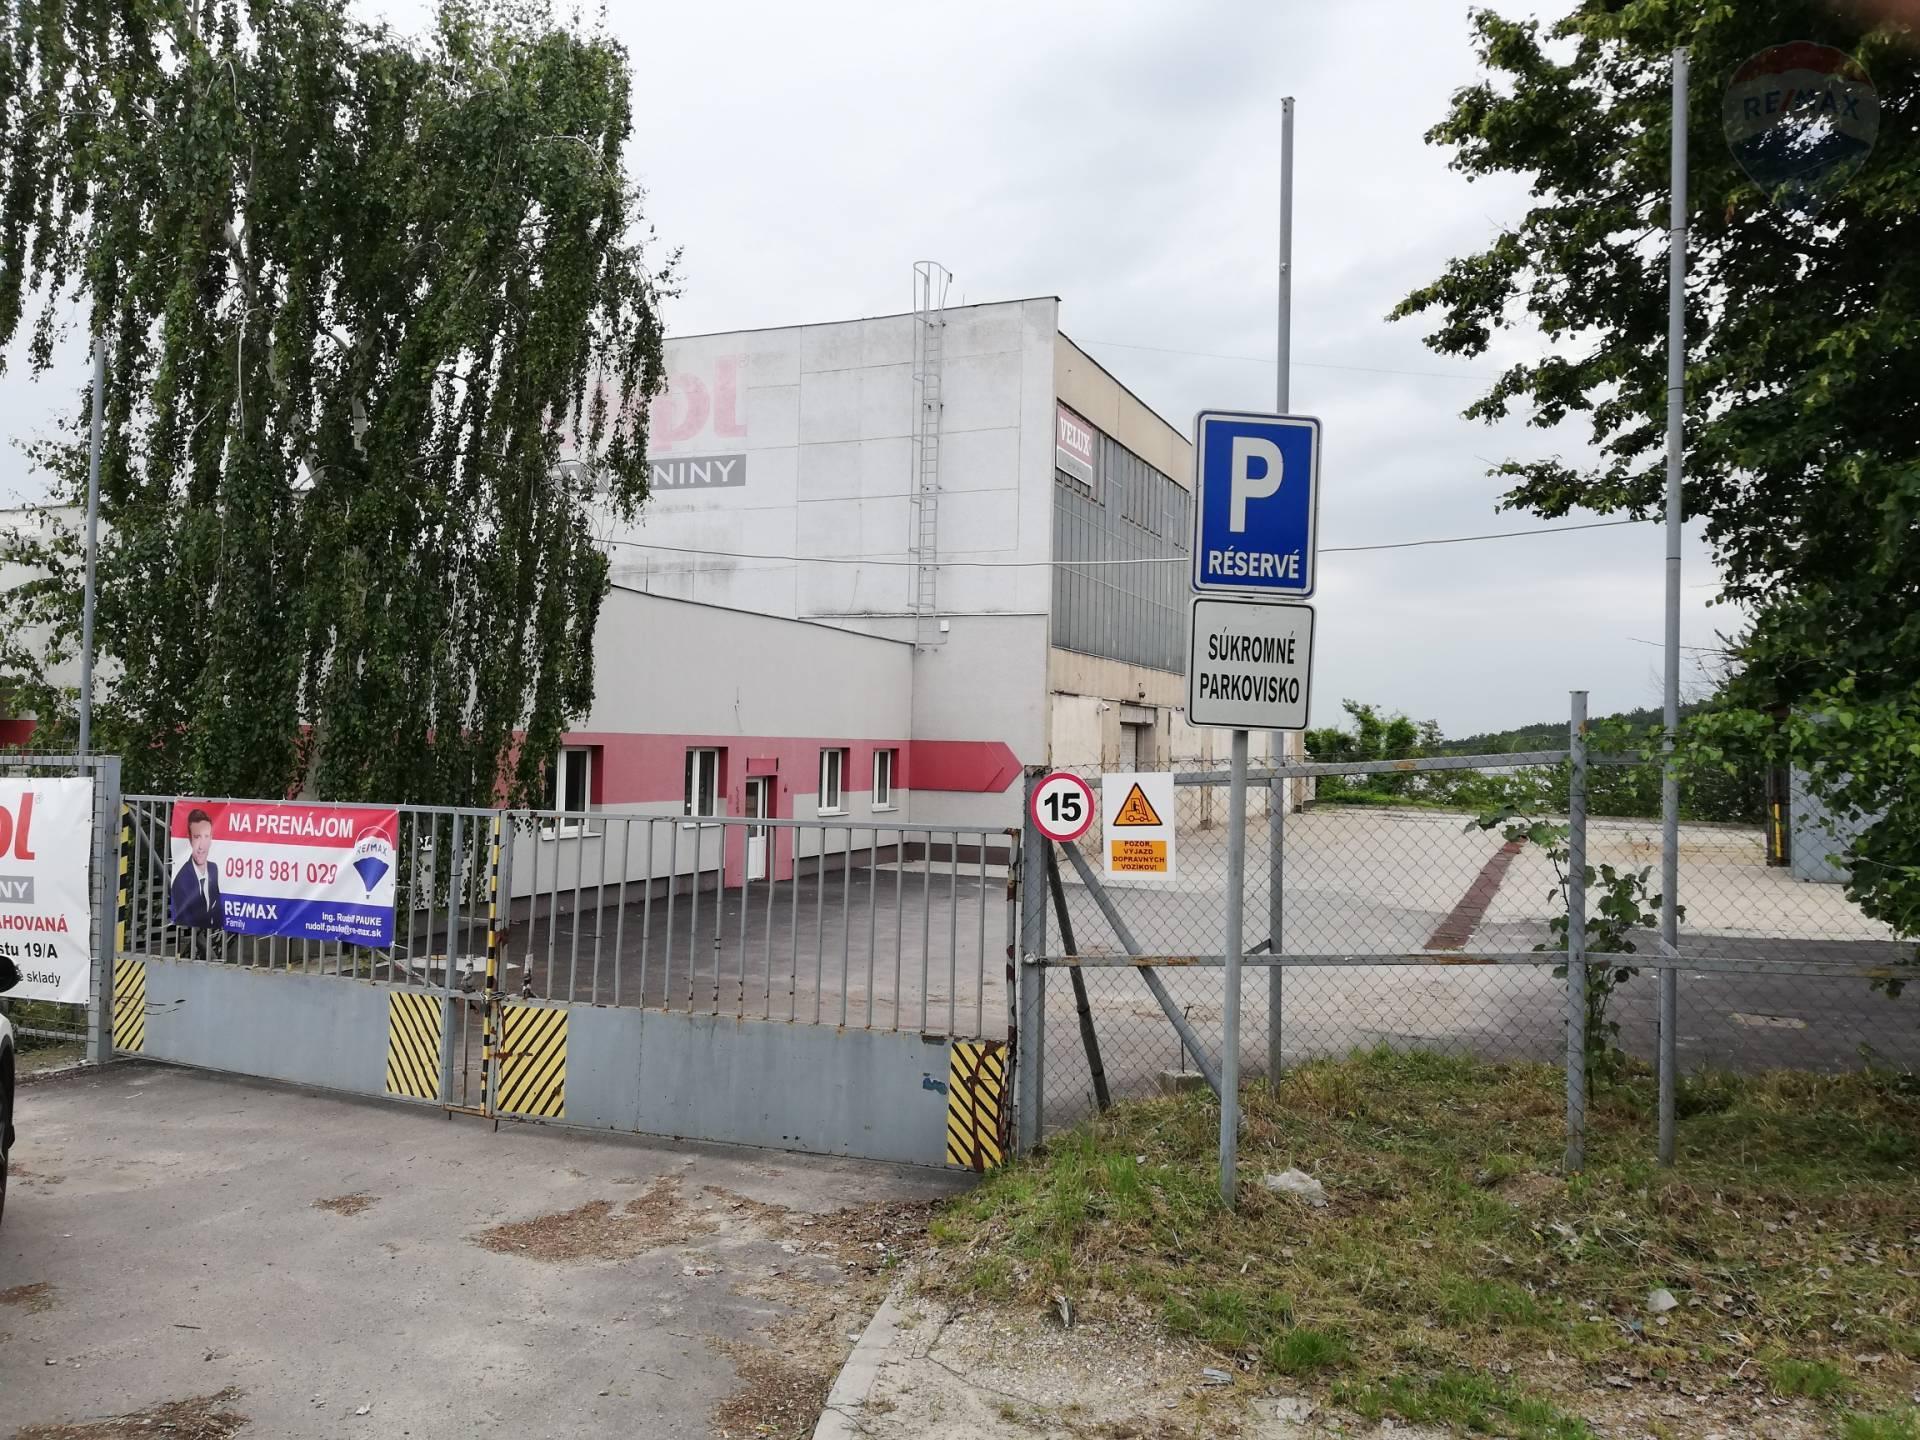 prenájom poľnohospodársky objekt Nitra, Cabajská